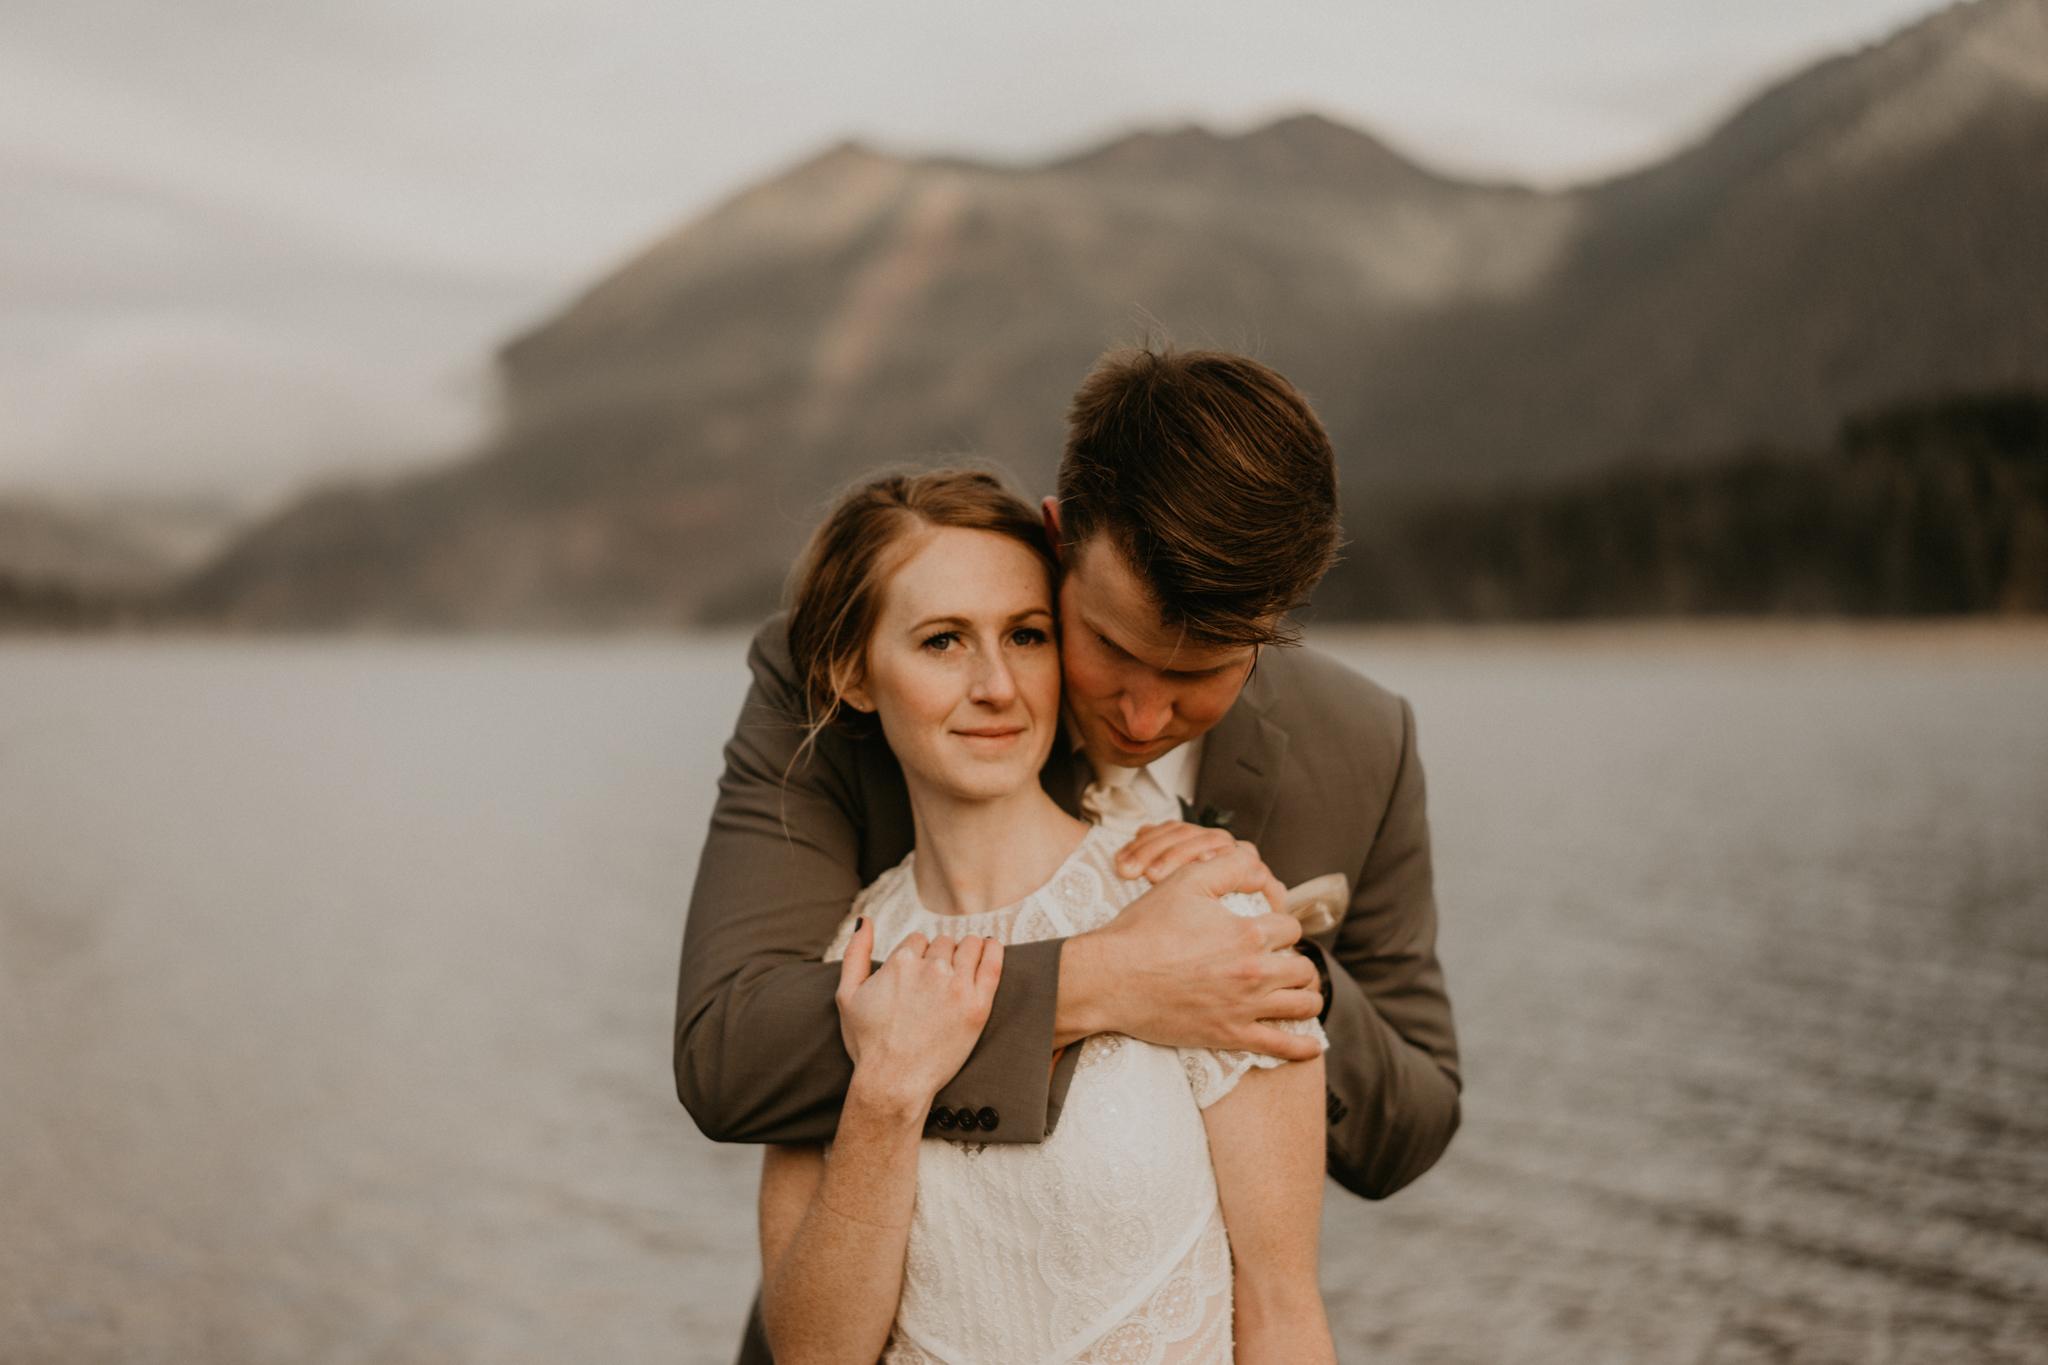 Lake-Cushman-Wedding-Elopement-Engagement-Seattle-Washington-PNW-Adventure-Nature-Photographer-12.jpg